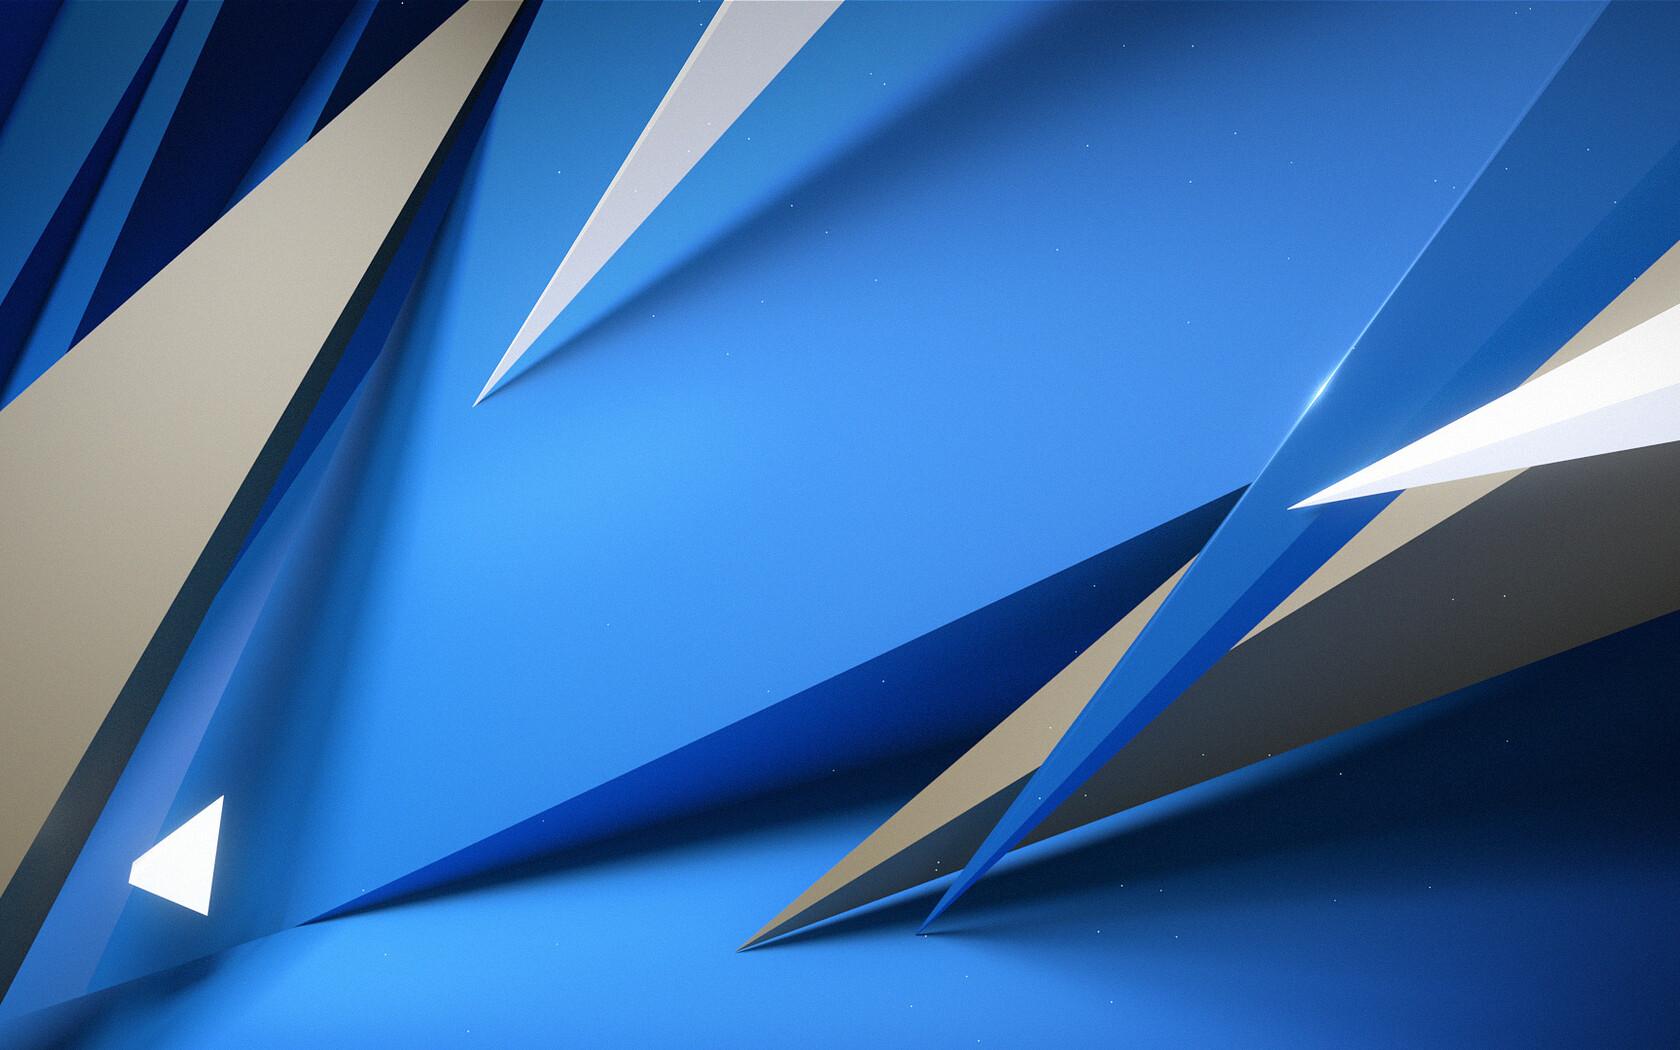 abstract-3d-sharp-shapes-hz.jpg